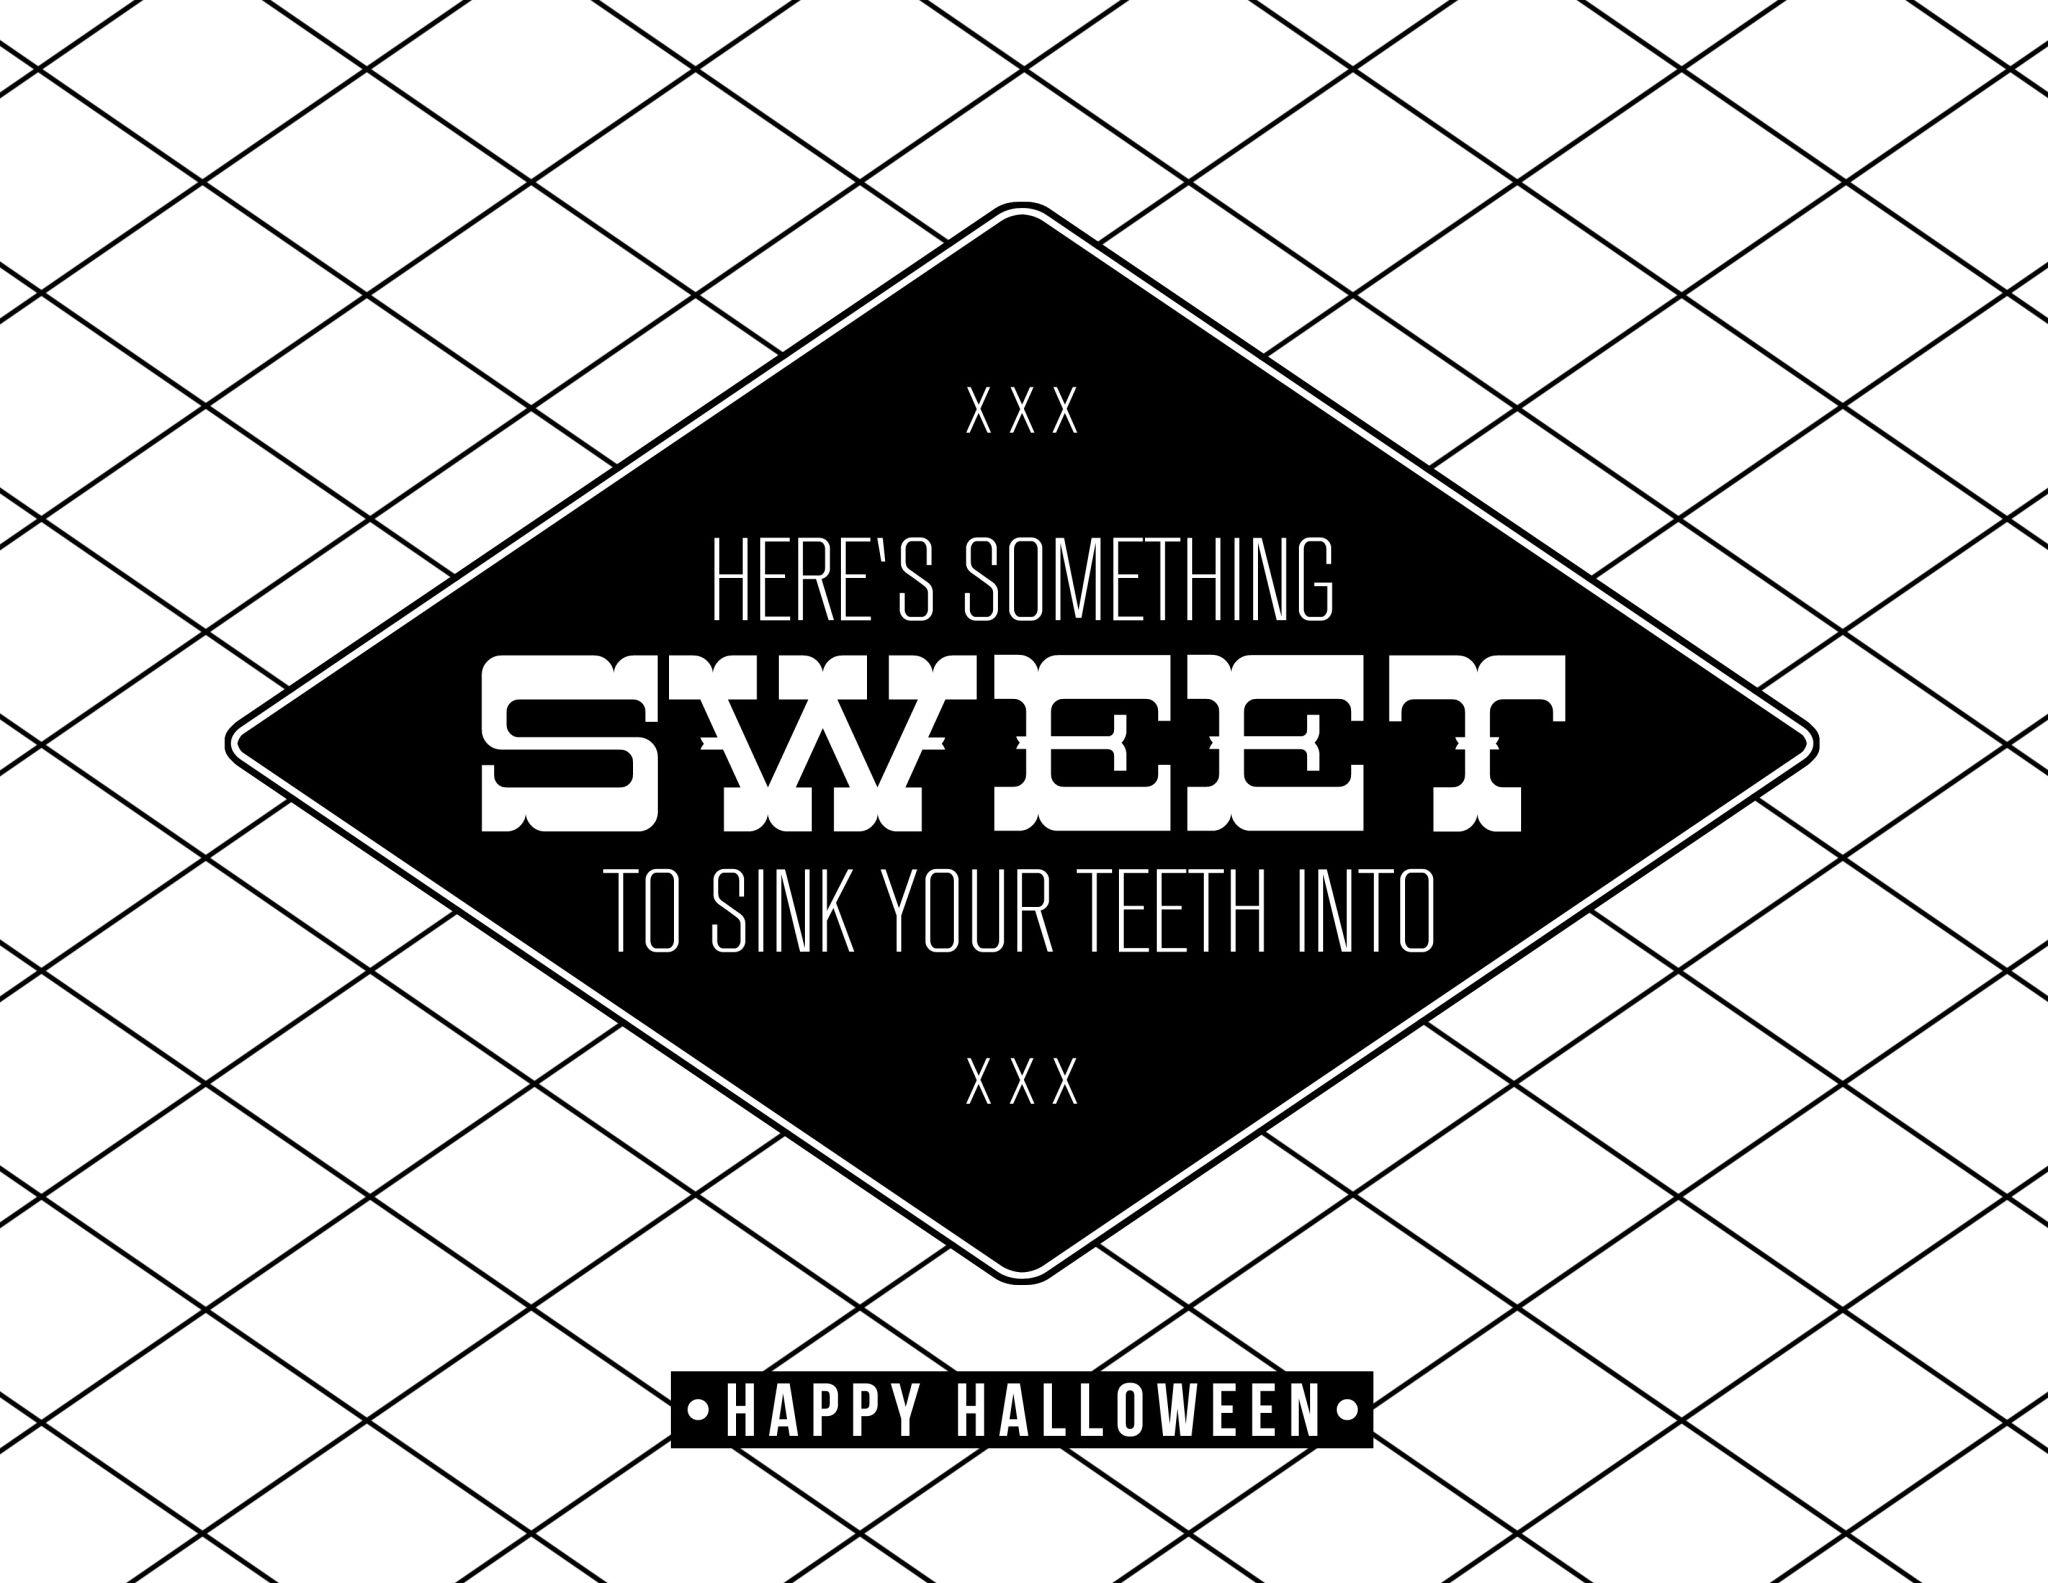 halloween sweet treat 85x11.jpg - File Shared from Box